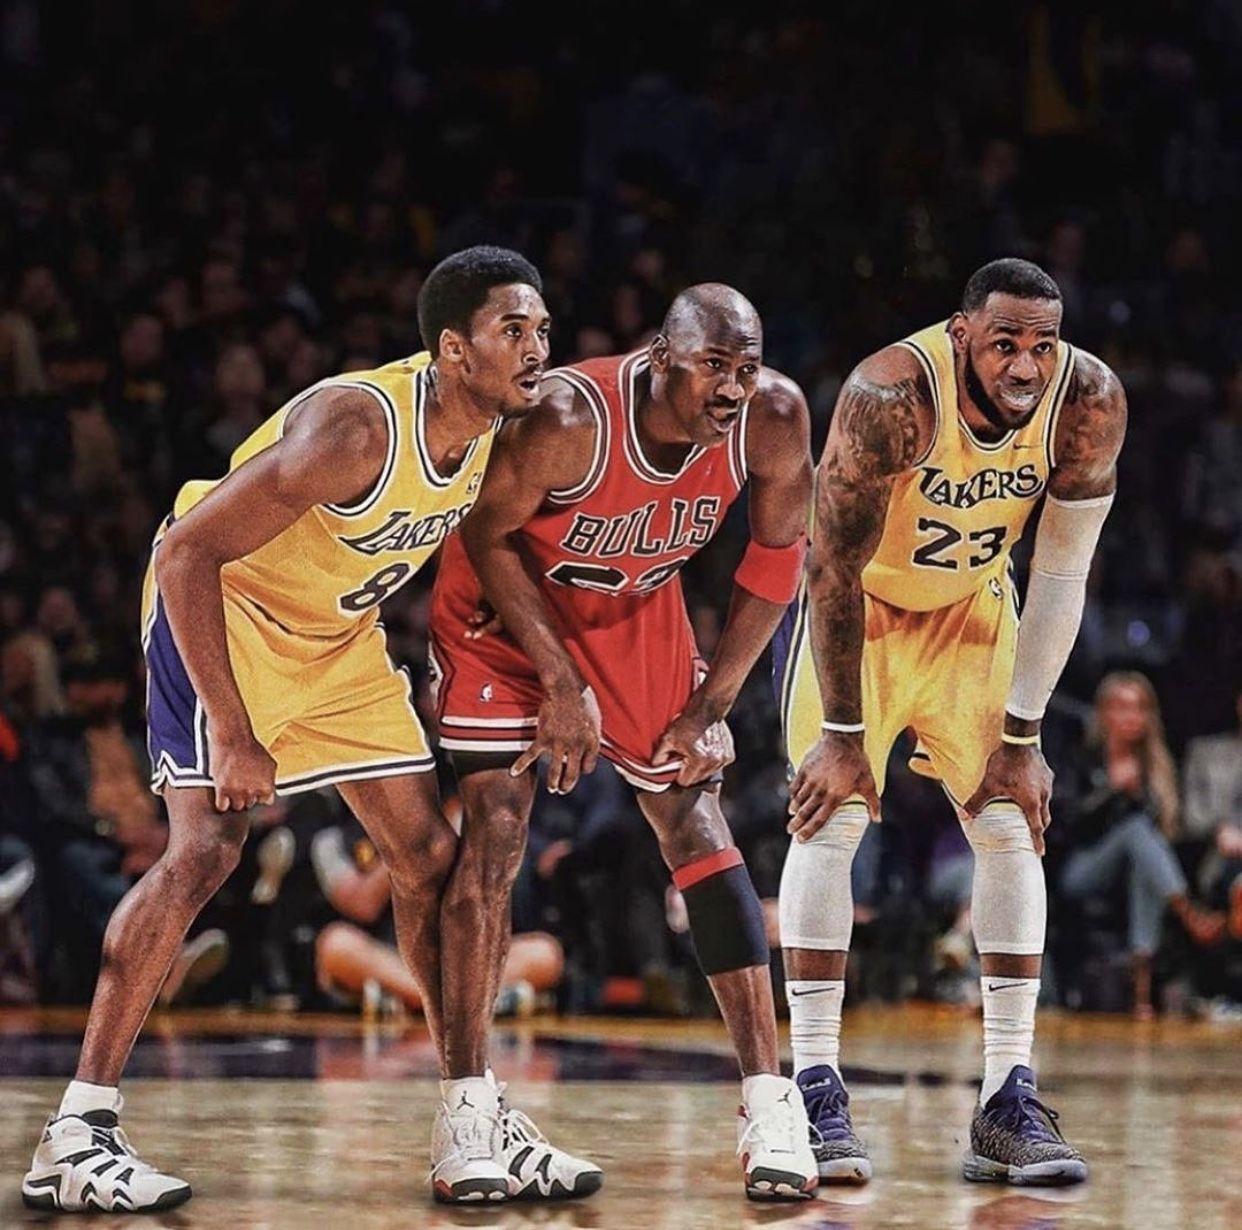 Lebron james, Kobe bryant pictures